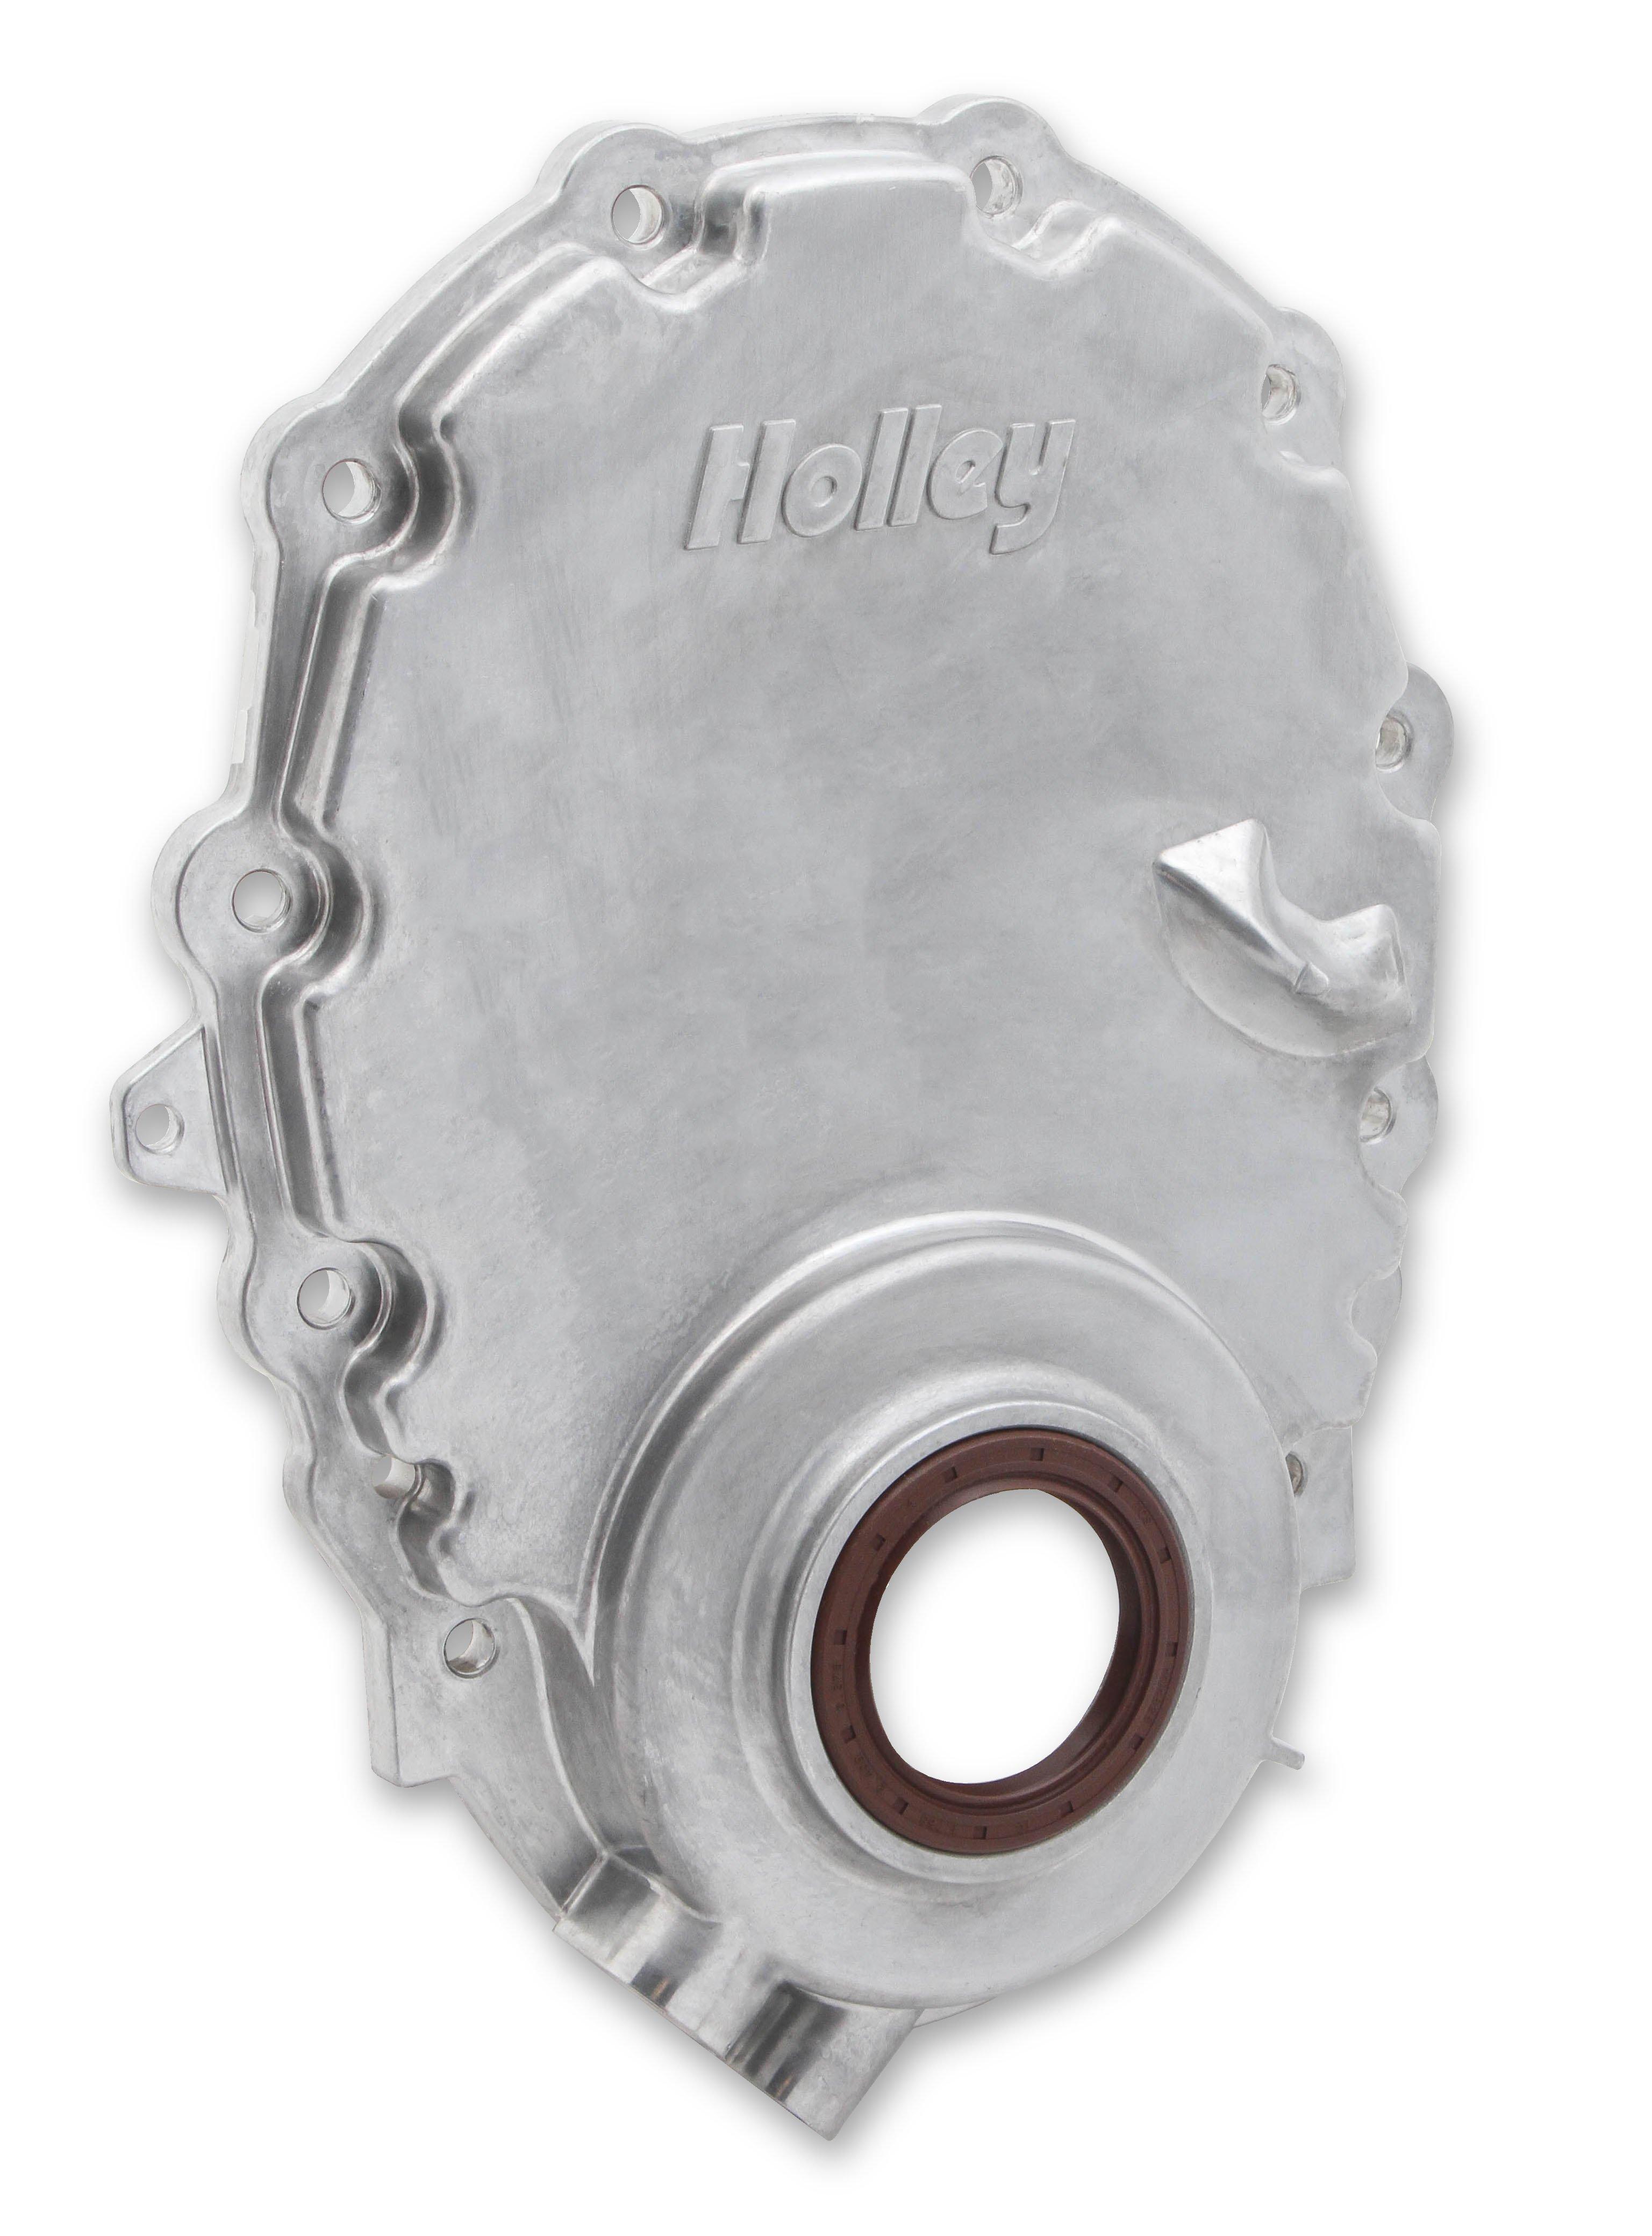 Holley 21 152 Cast Aluminum Timing Chain Cover 4 3l Vortec Engine Diagram Image